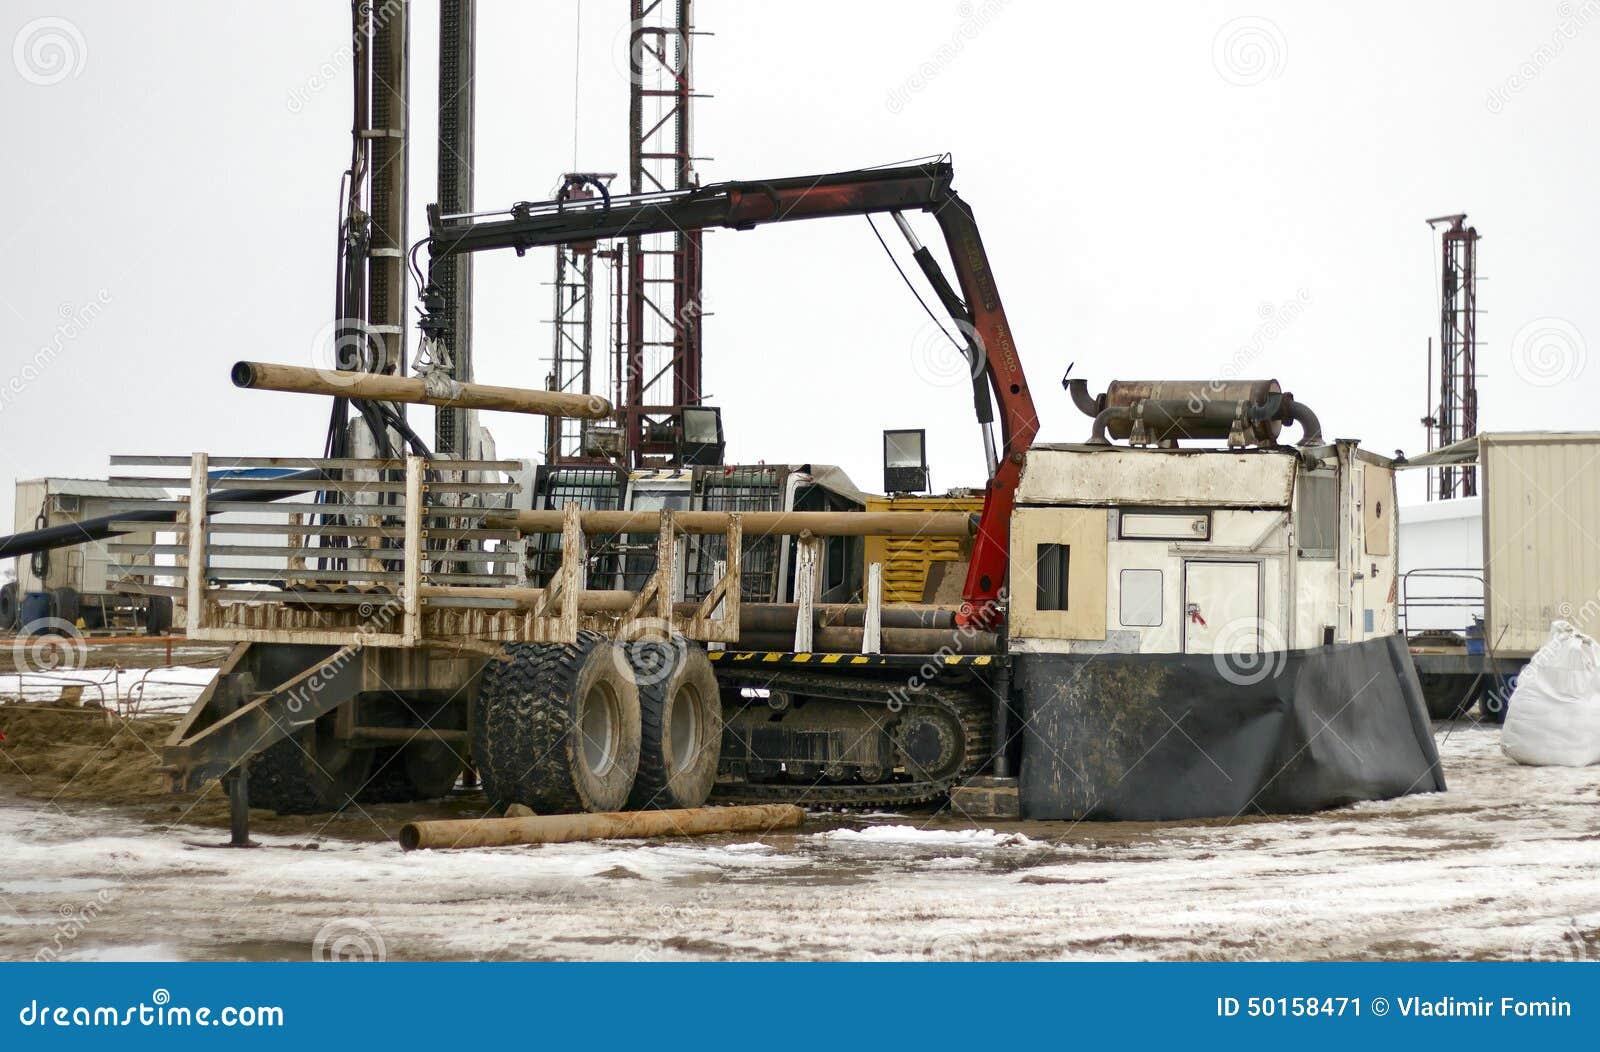 Download Land drilling rig stock image. Image of desert, steppe - 50158471